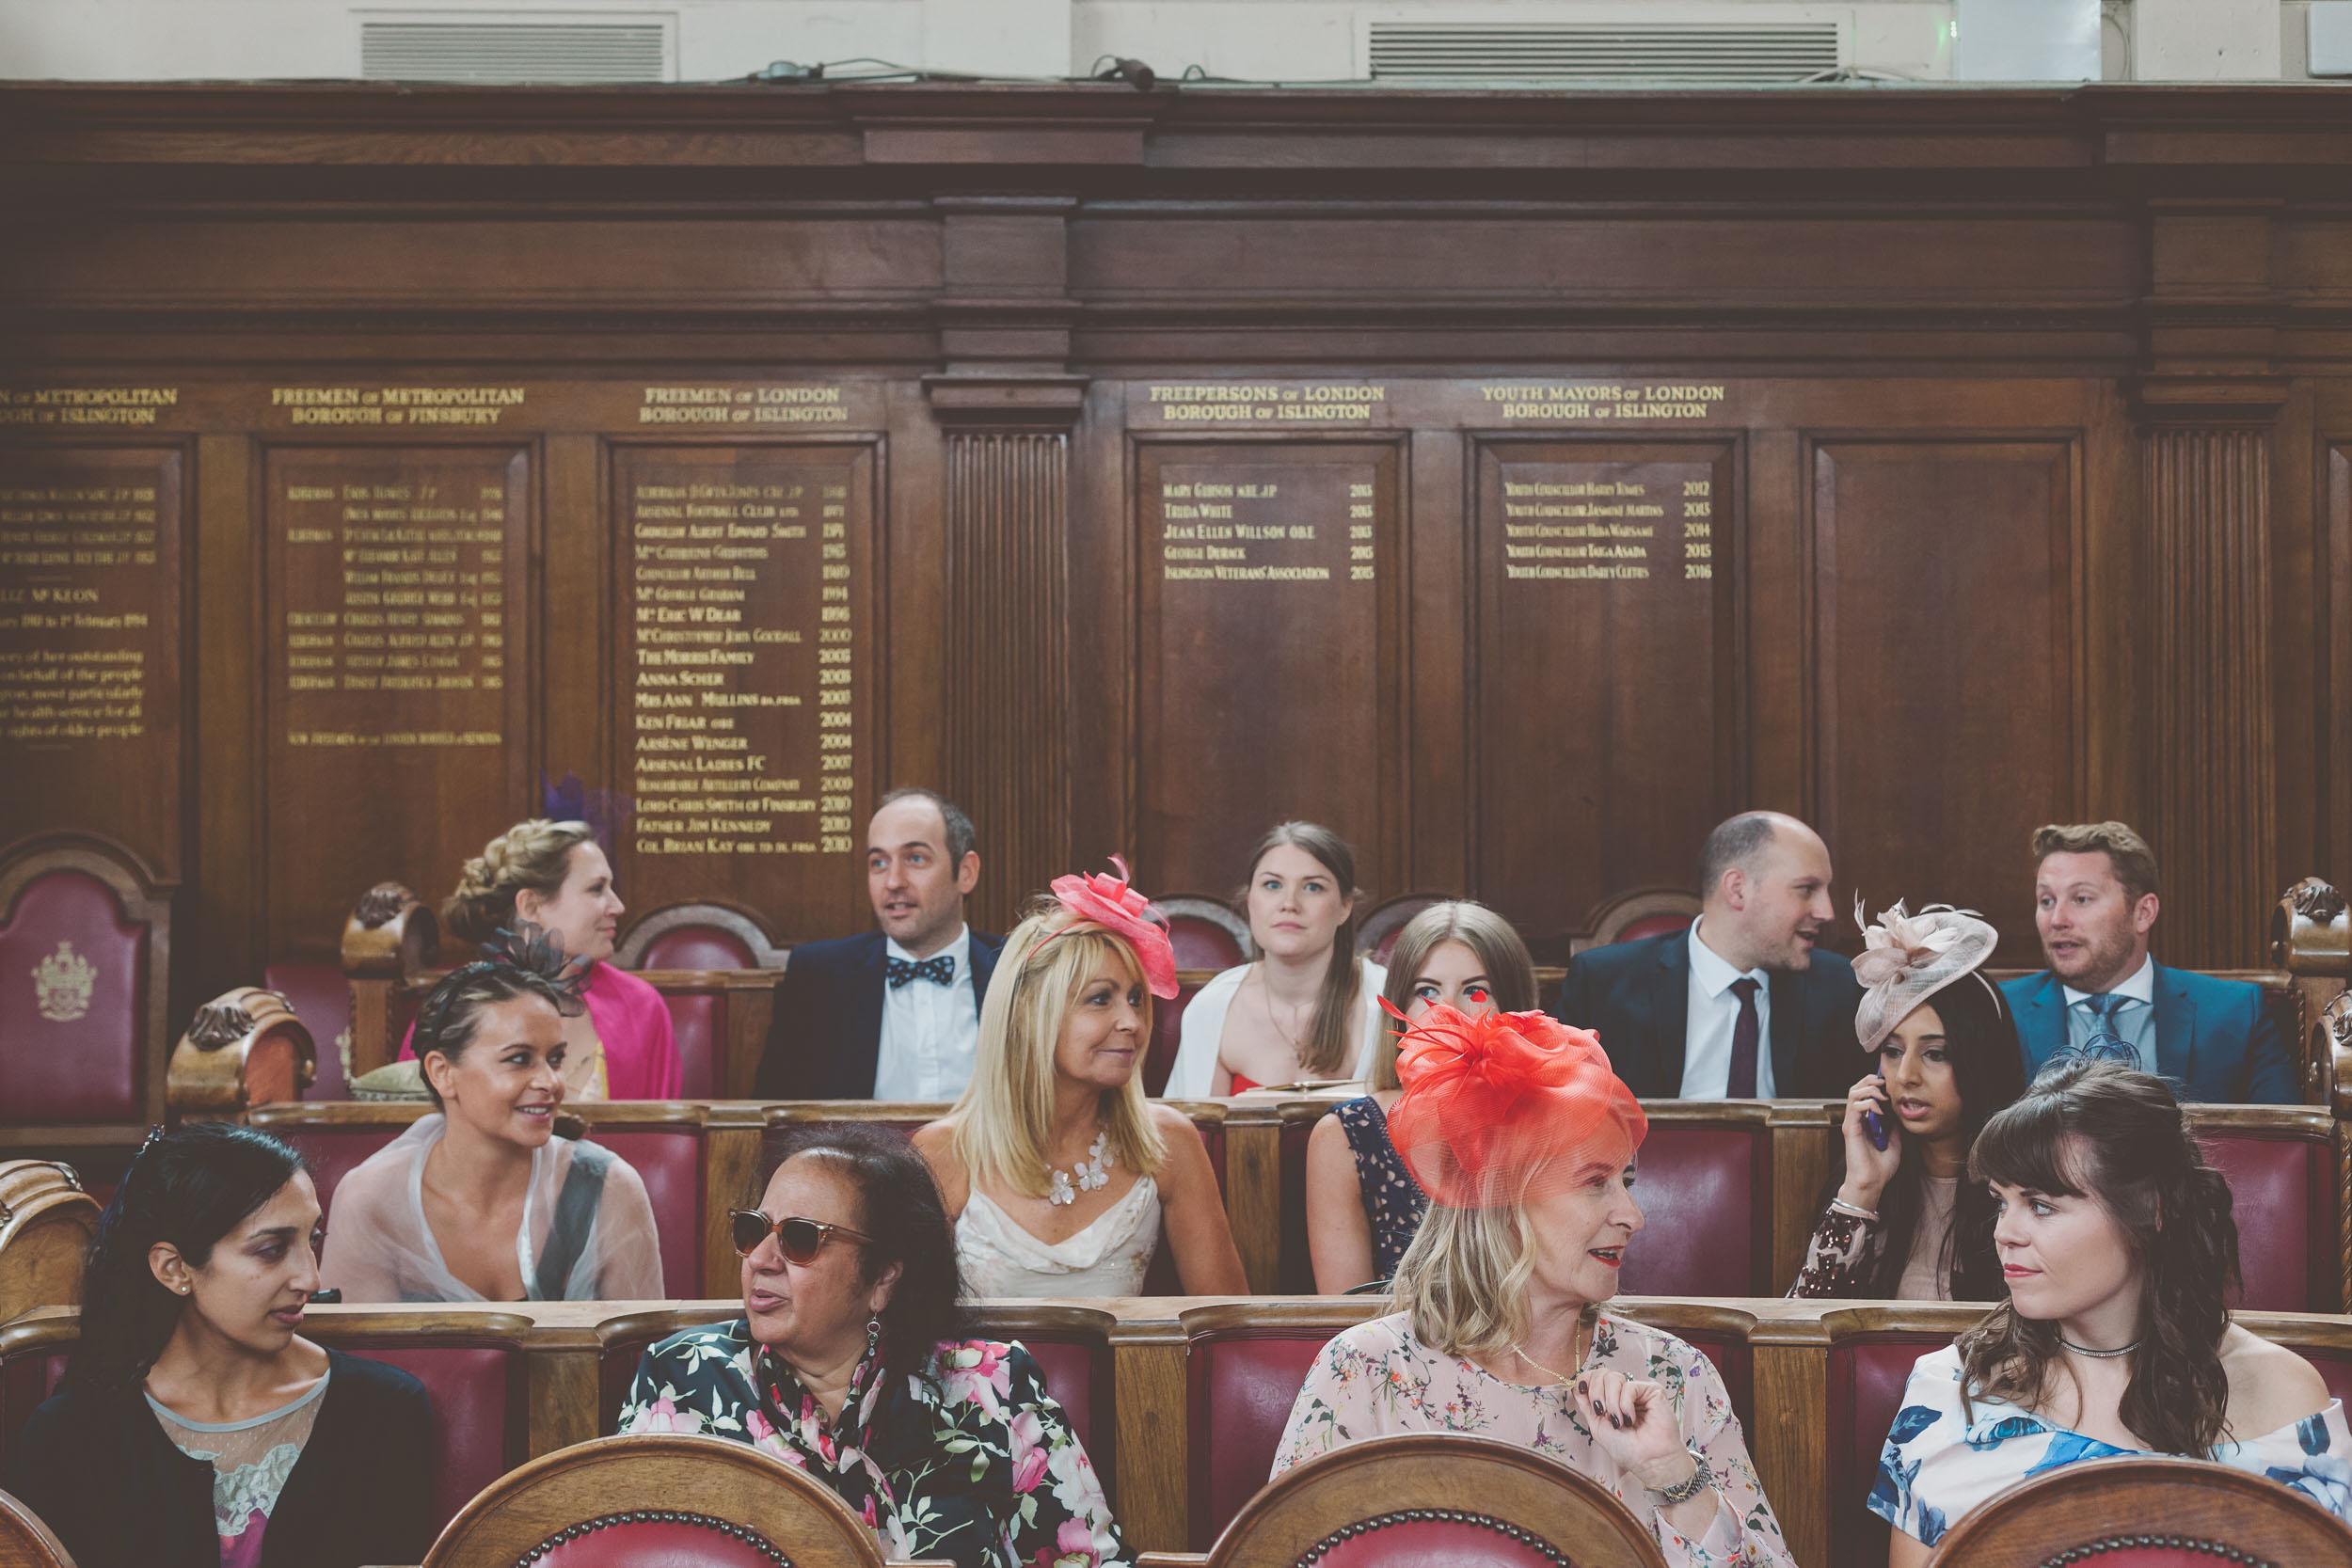 islington-town-hall-4th-floor-studios-wedding011.jpg